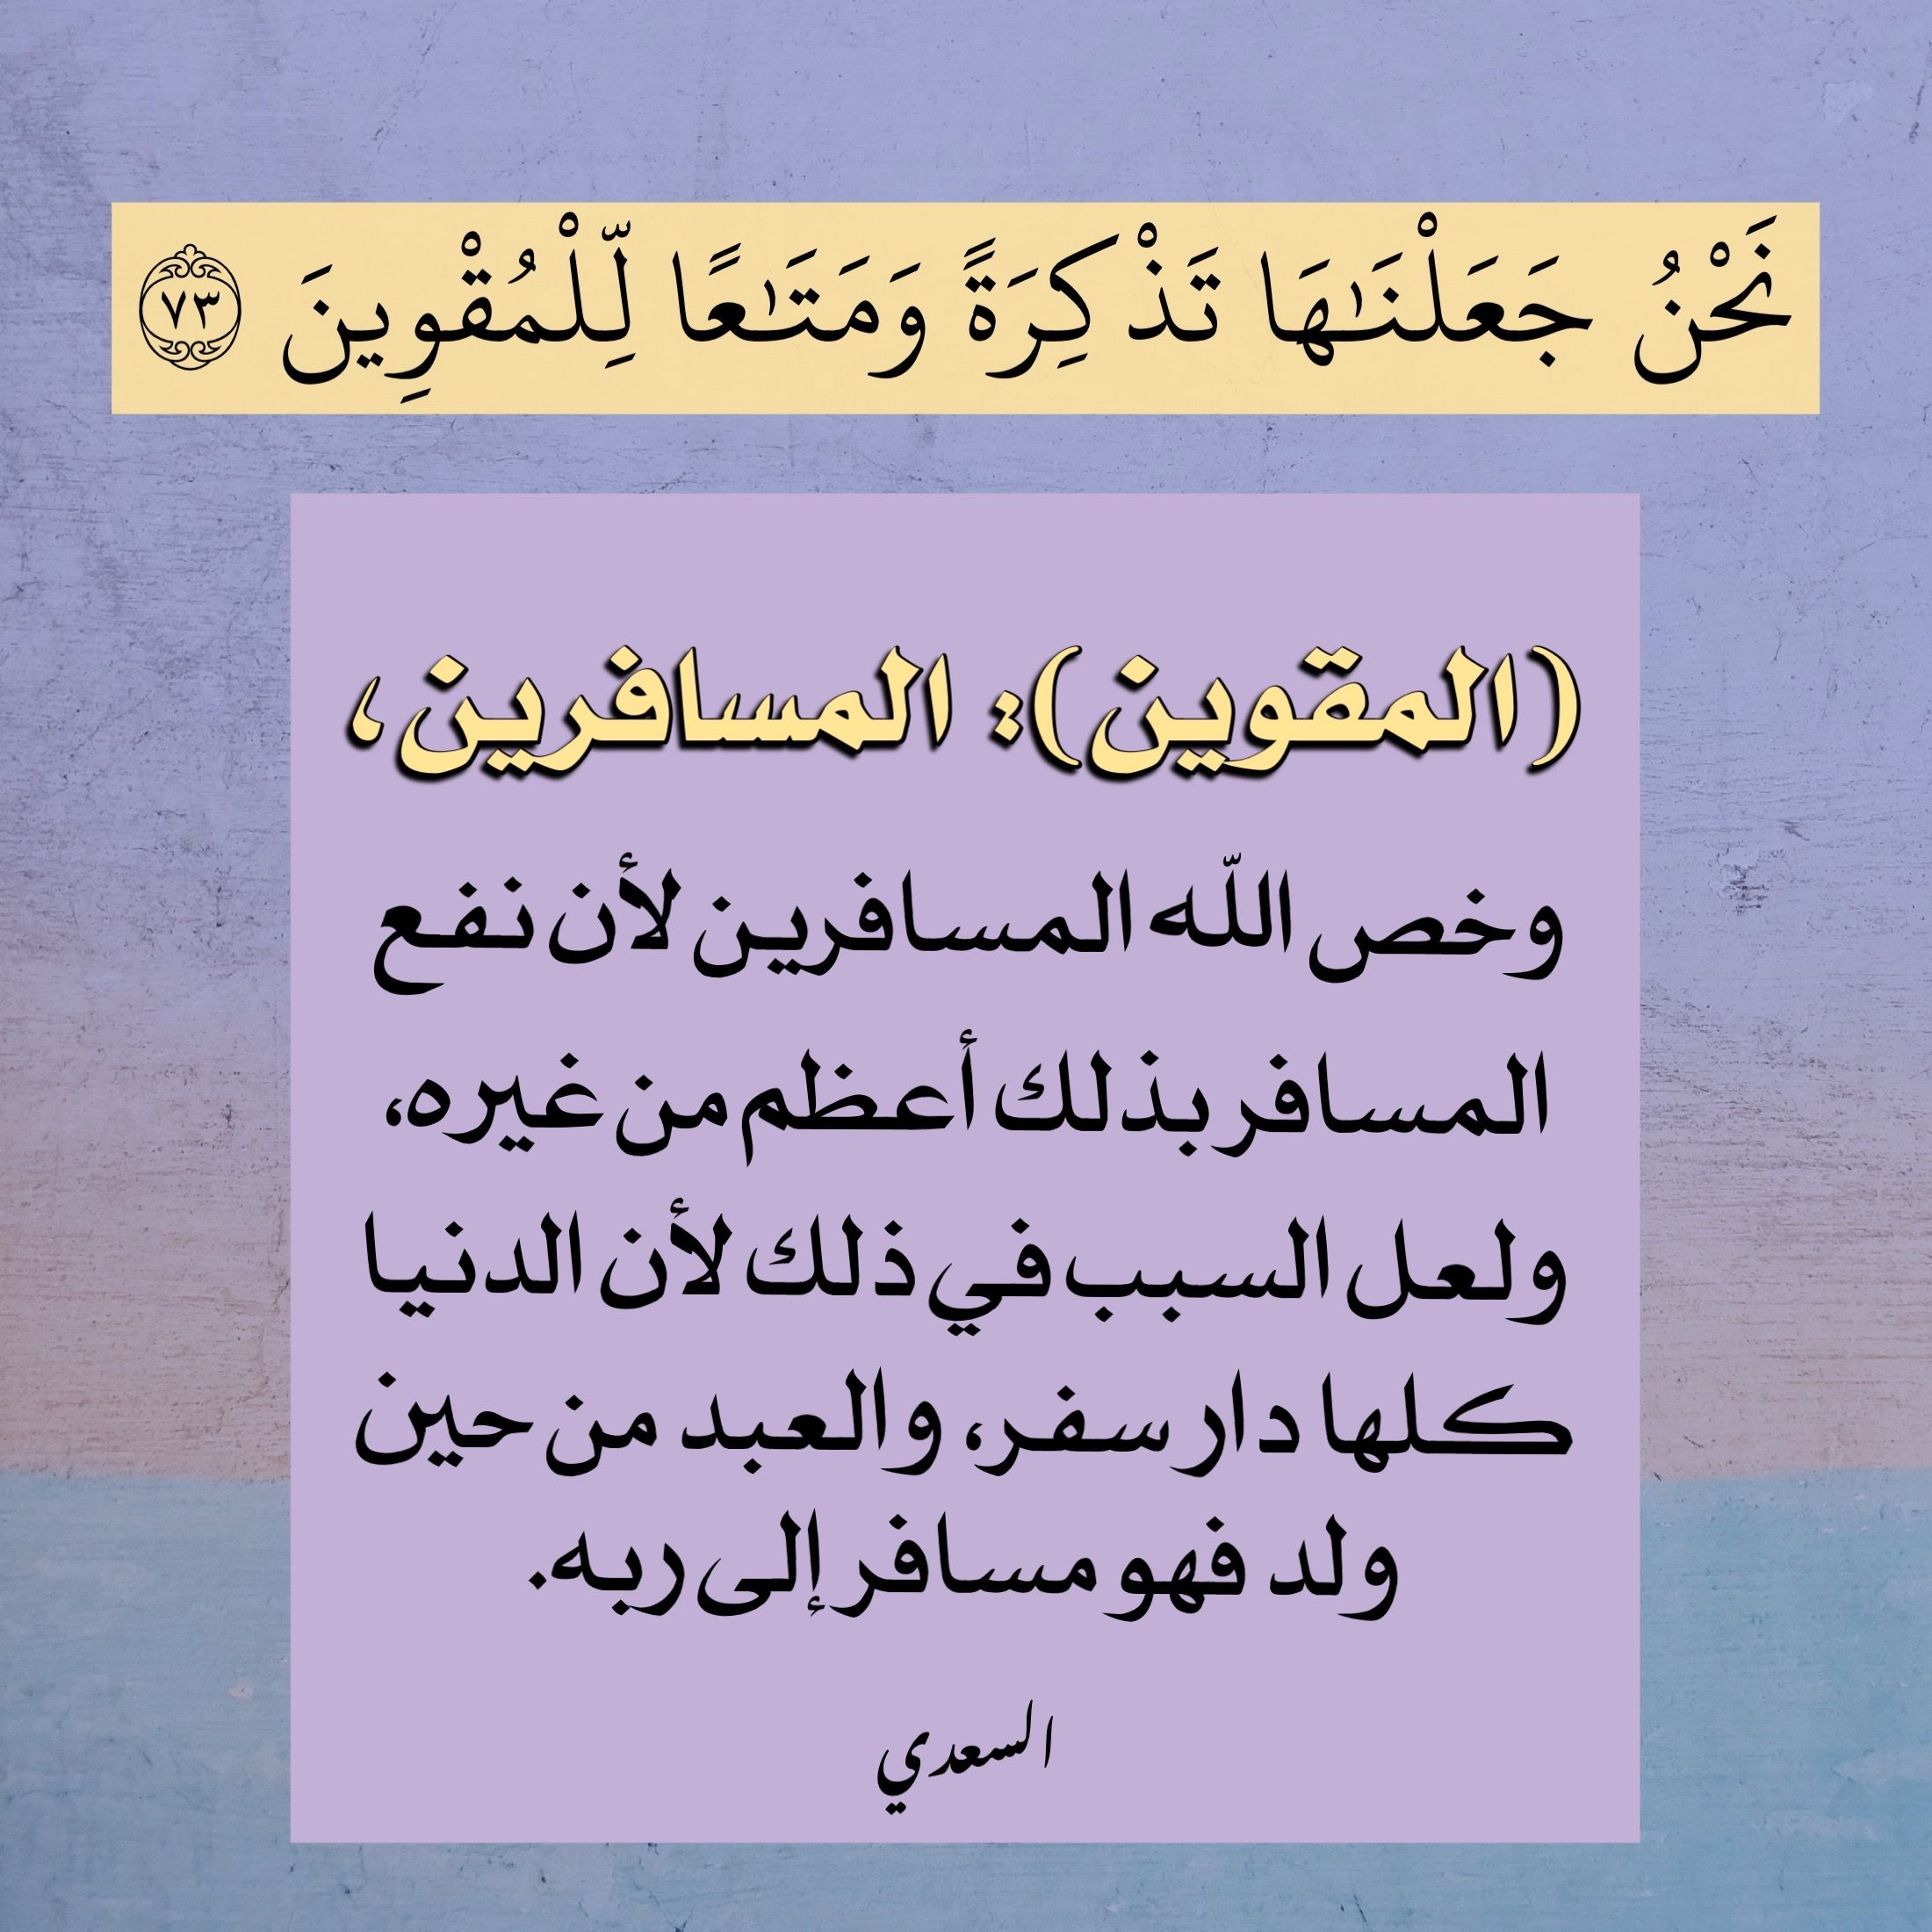 Pin By Nour Nouh On تدبرات Islamic Quotes Wallpaper Wallpaper Quotes Islamic Quotes